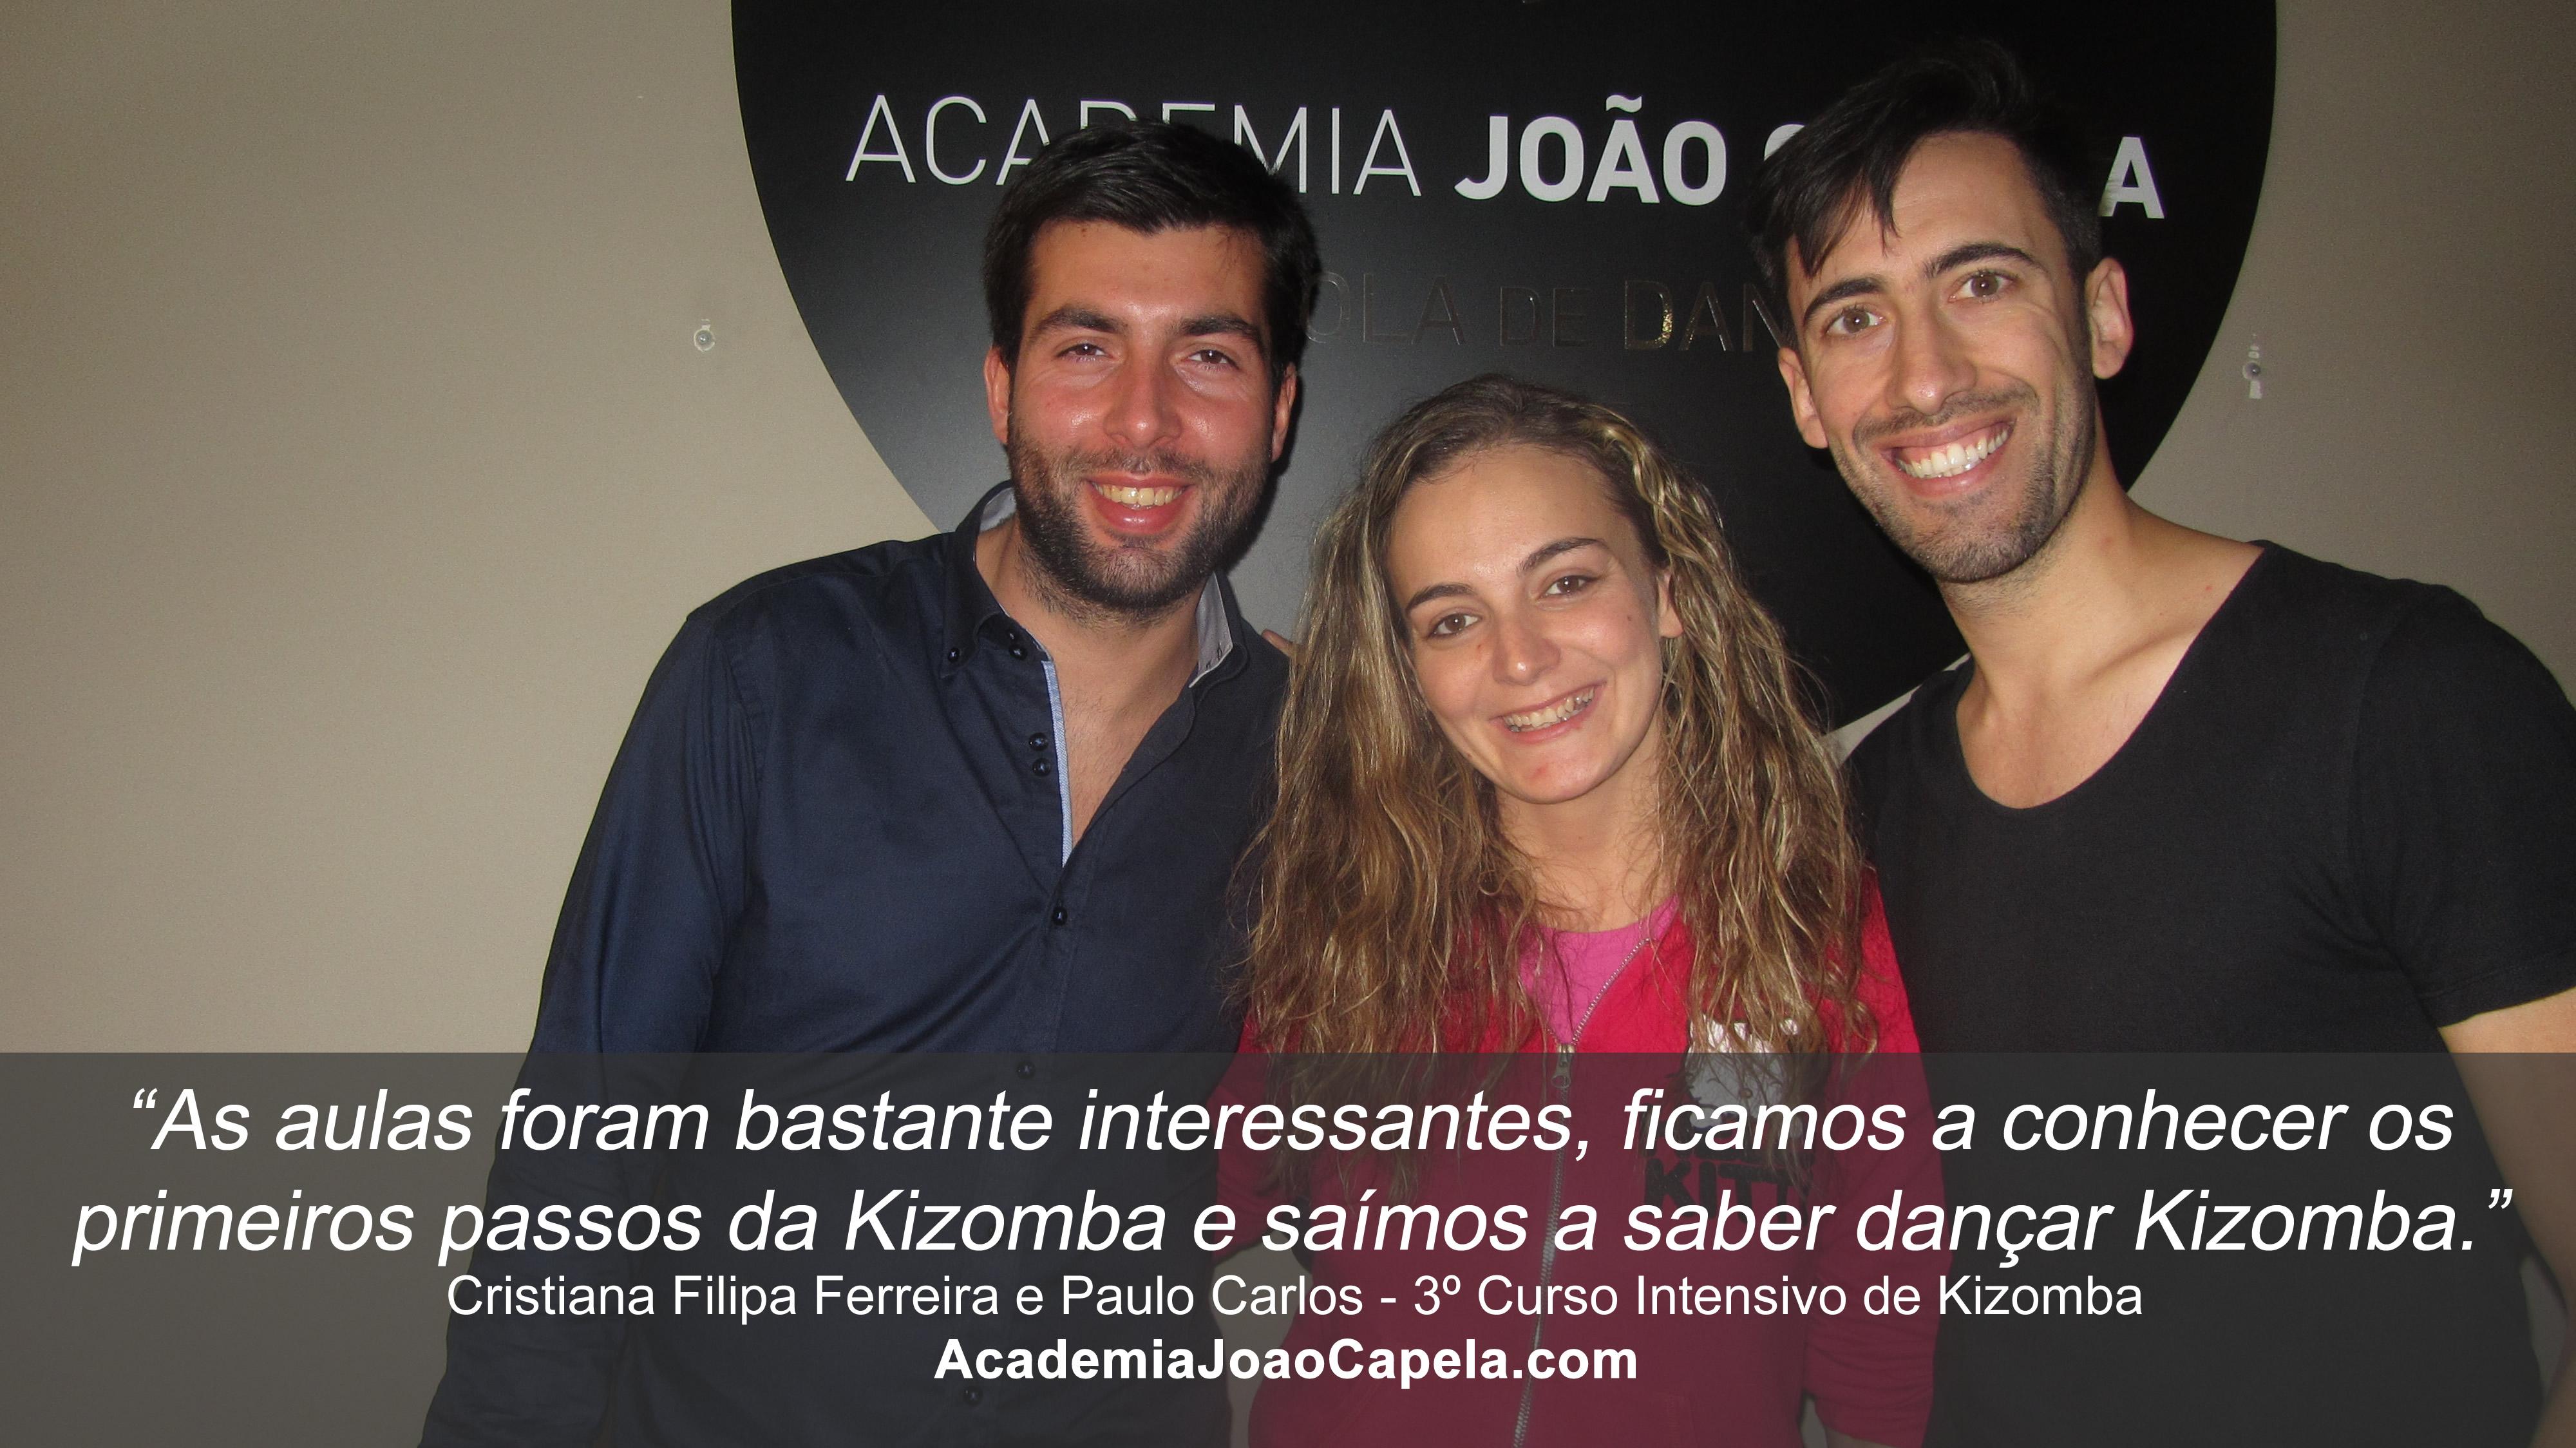 Testemunho Cristiana Filipa e Paulo 3º Curso Intensivo de Kizomba em Barcelos